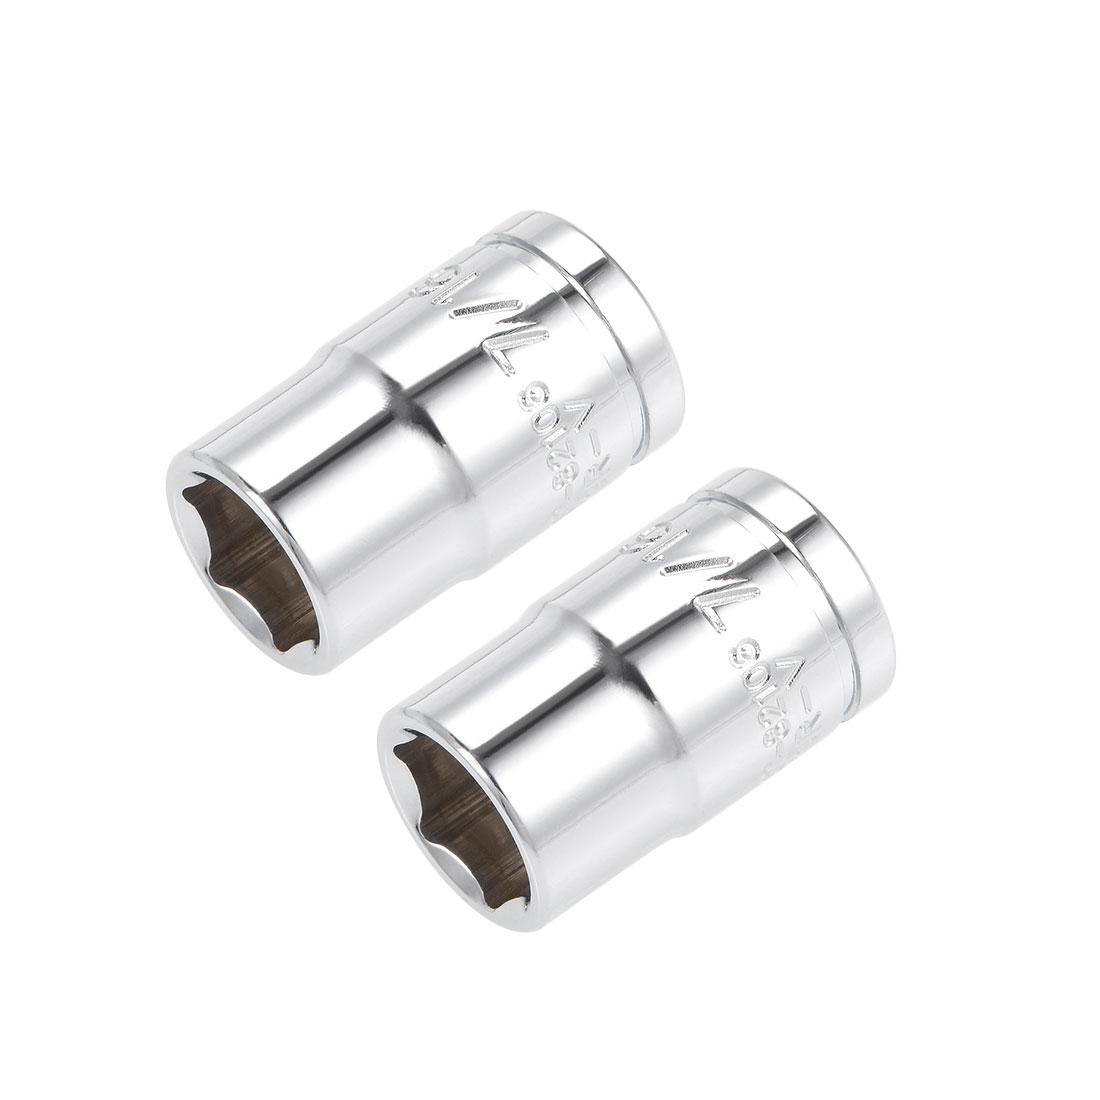 2 Pcs 3/8-inch Drive 7/16-inch 6-Point Shallow Socket, Cr-V